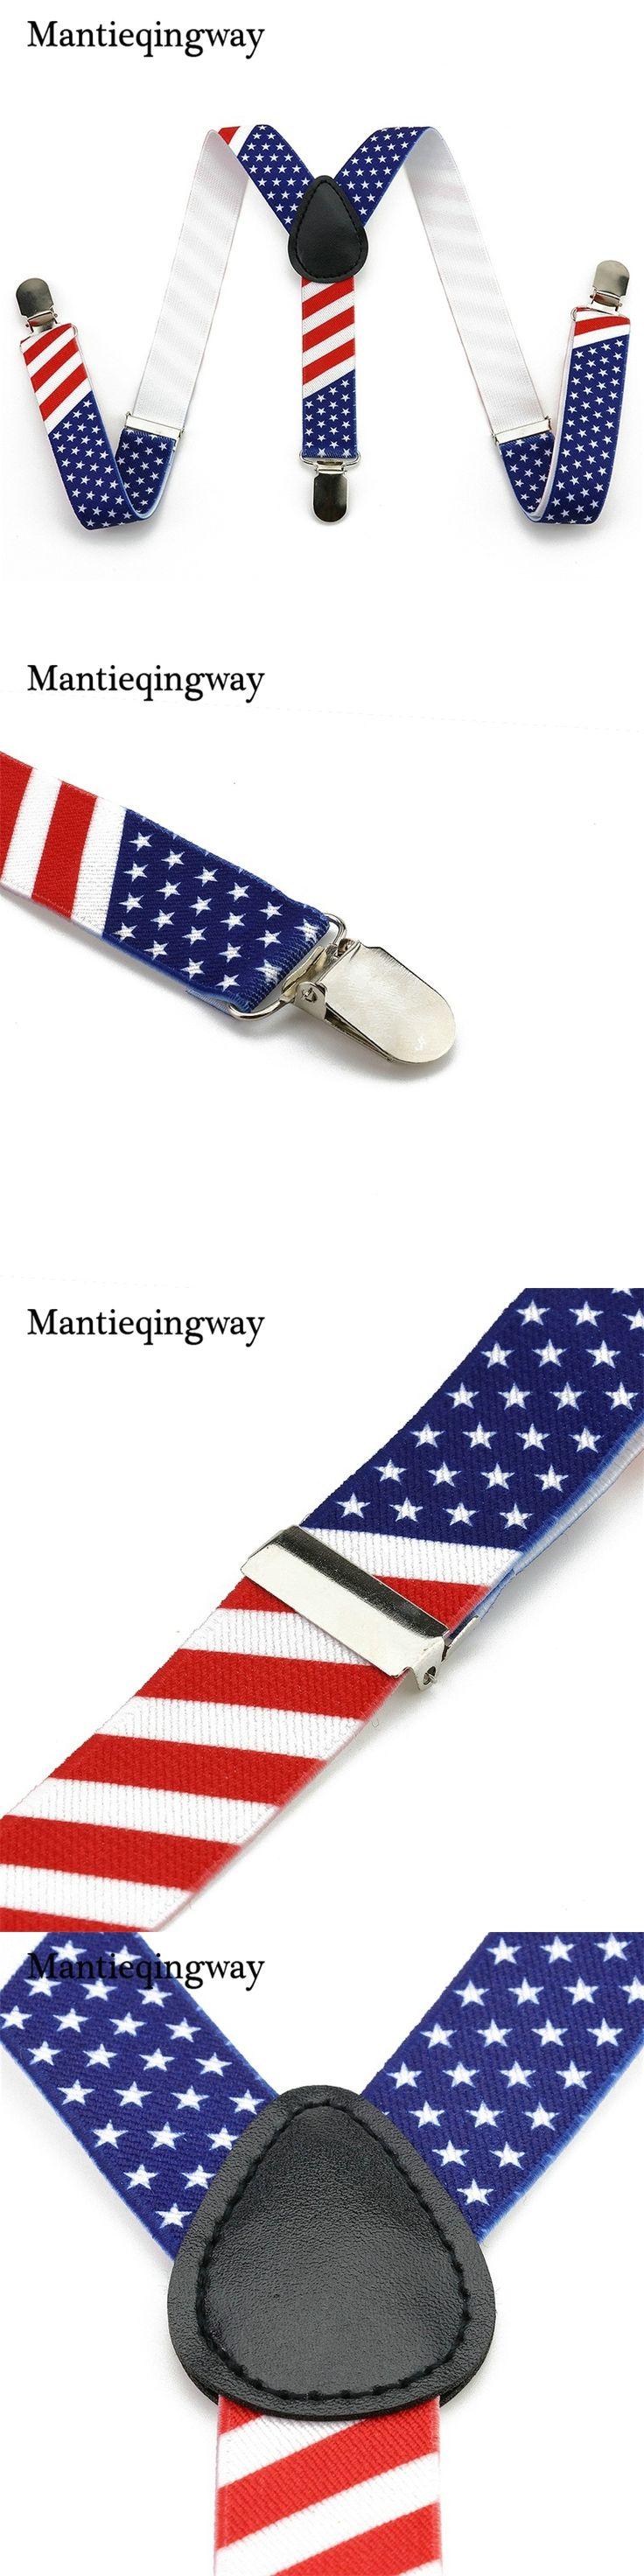 Mantieqingway Stars Striped Elastic Braces Suspenders Blue 3 Clip-on Suspenders For Children Y Back Shirt Garters For Boy&Girl